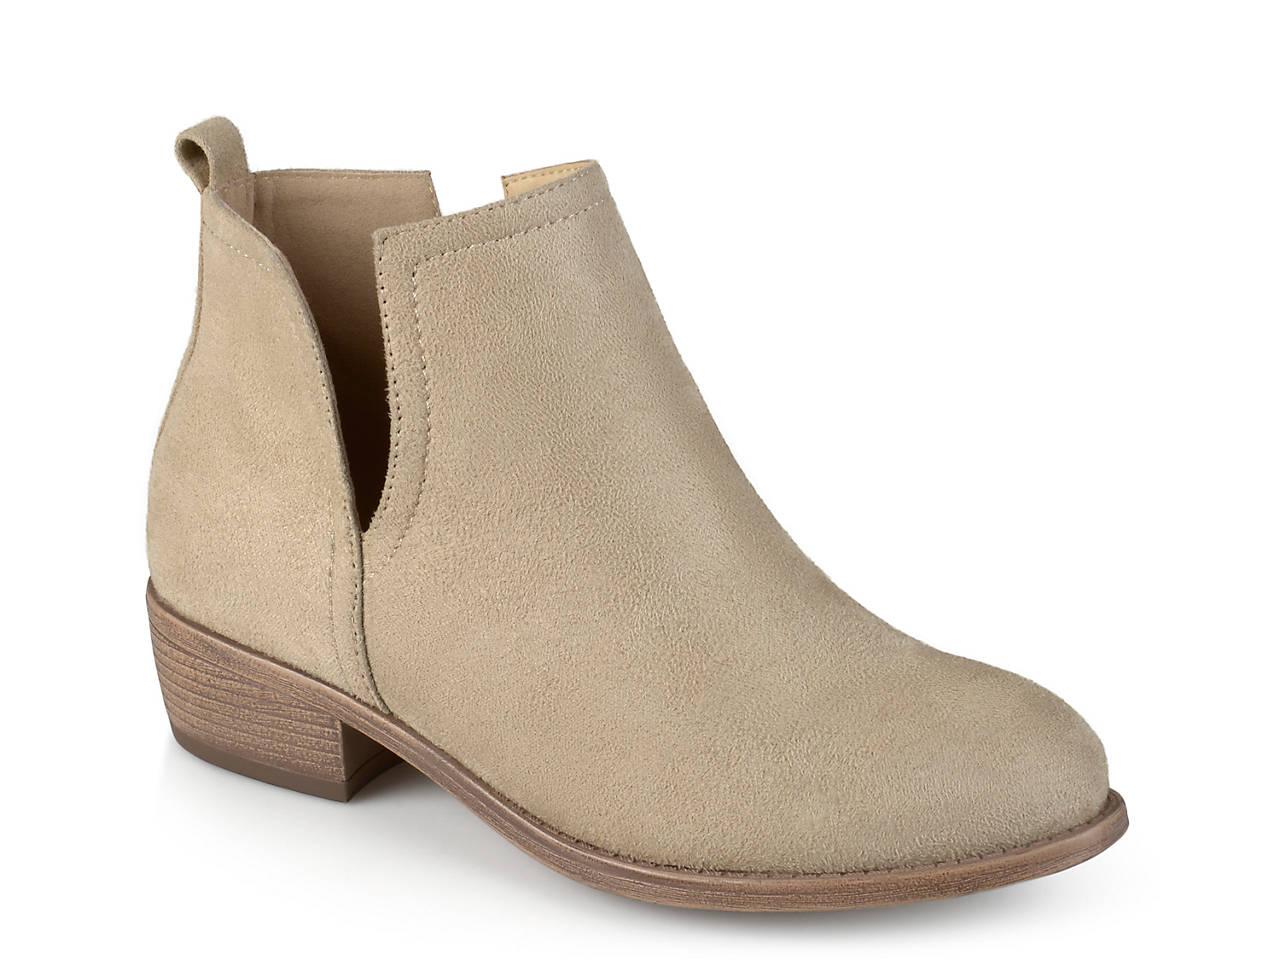 5060b444cd3 Journee Collection Rimi Bootie Women's Shoes | DSW